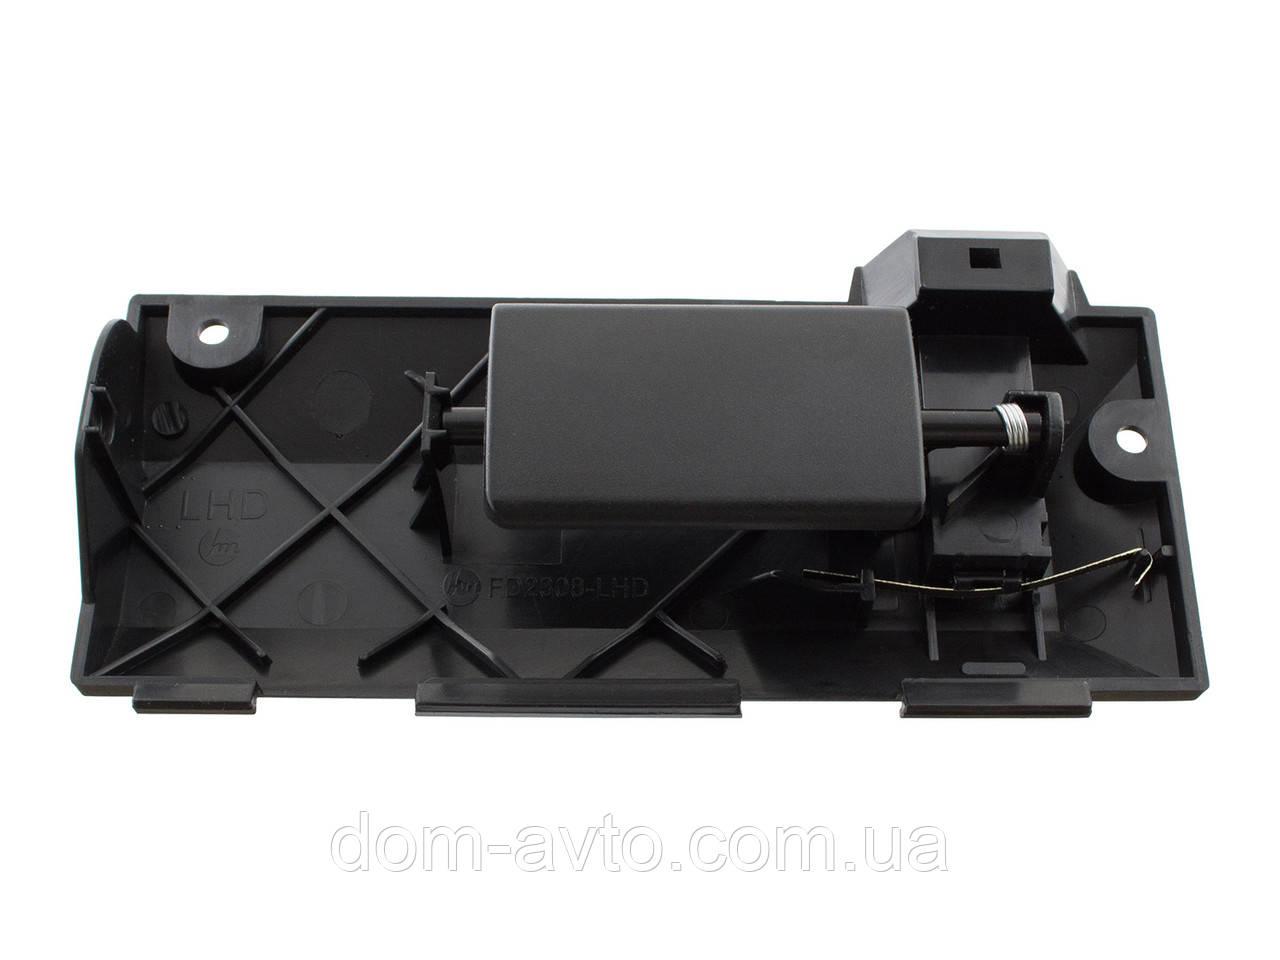 Ручка замок бардачка 1362610 Ford Mondeo Mk3 00-07 форд мондео